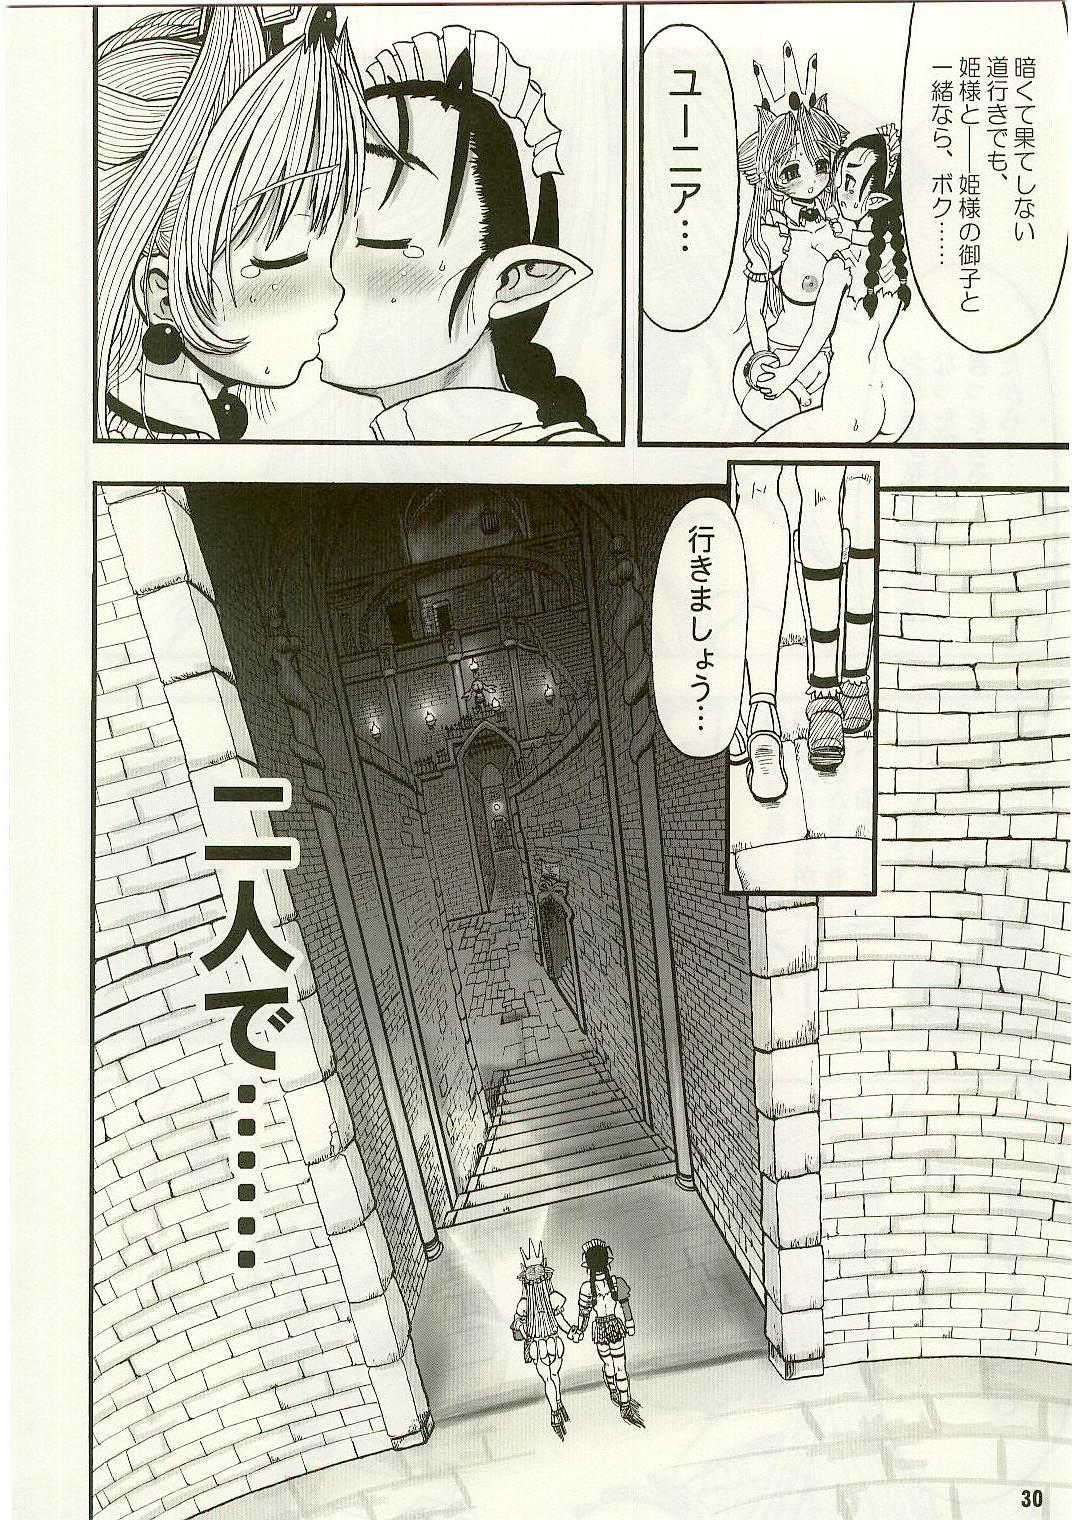 TGWOA Vol.17 - Meikyuu Oujo Prina 3 27